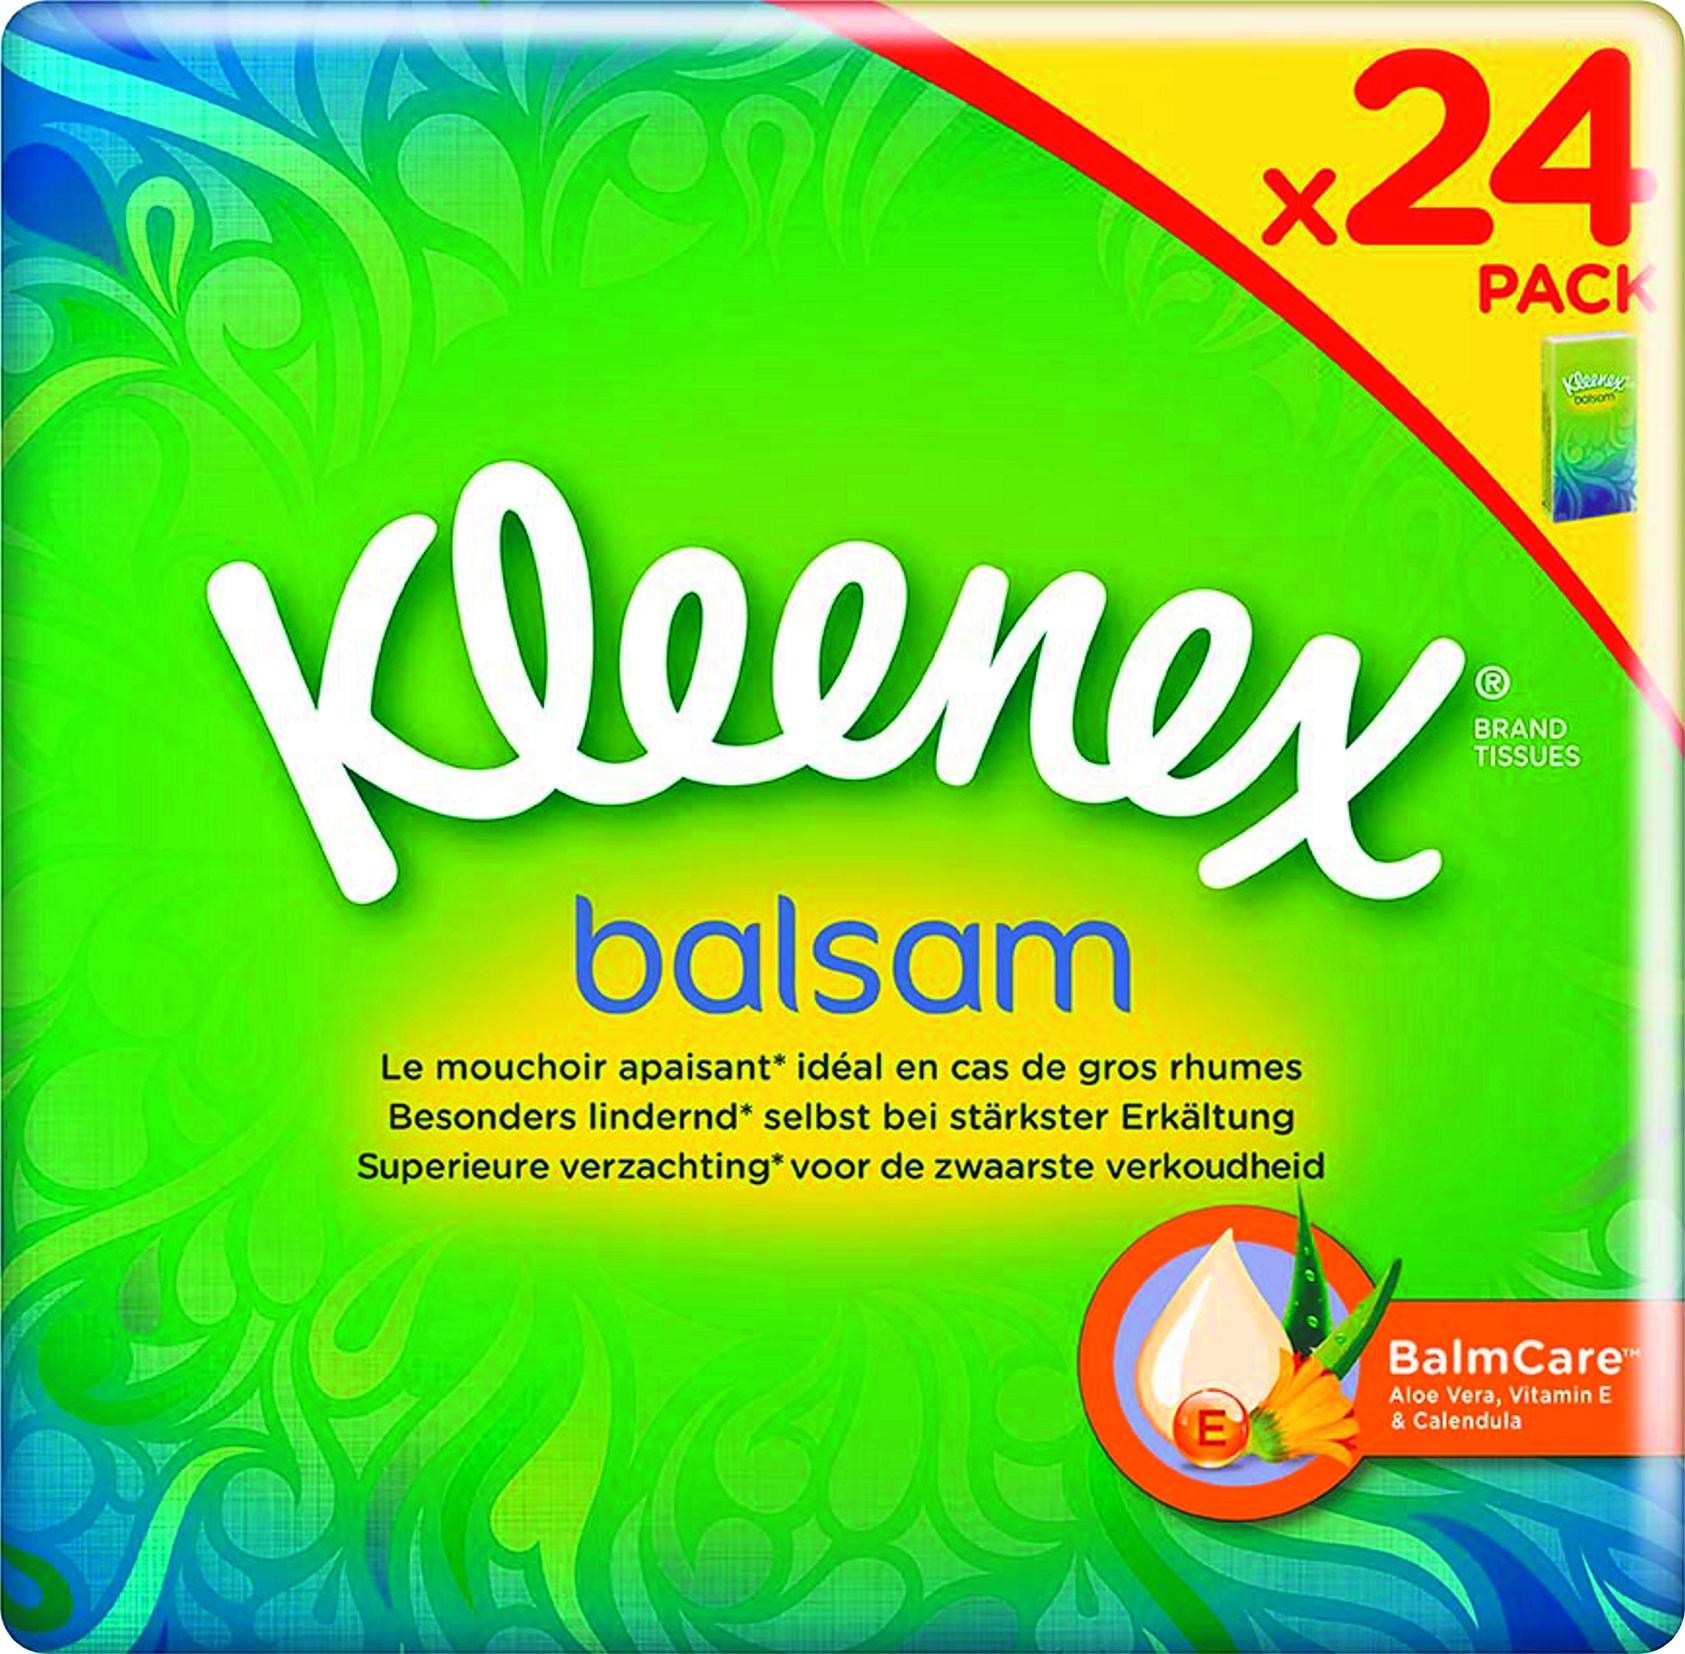 Balsam Taschentuecher Pocket 24x9pc